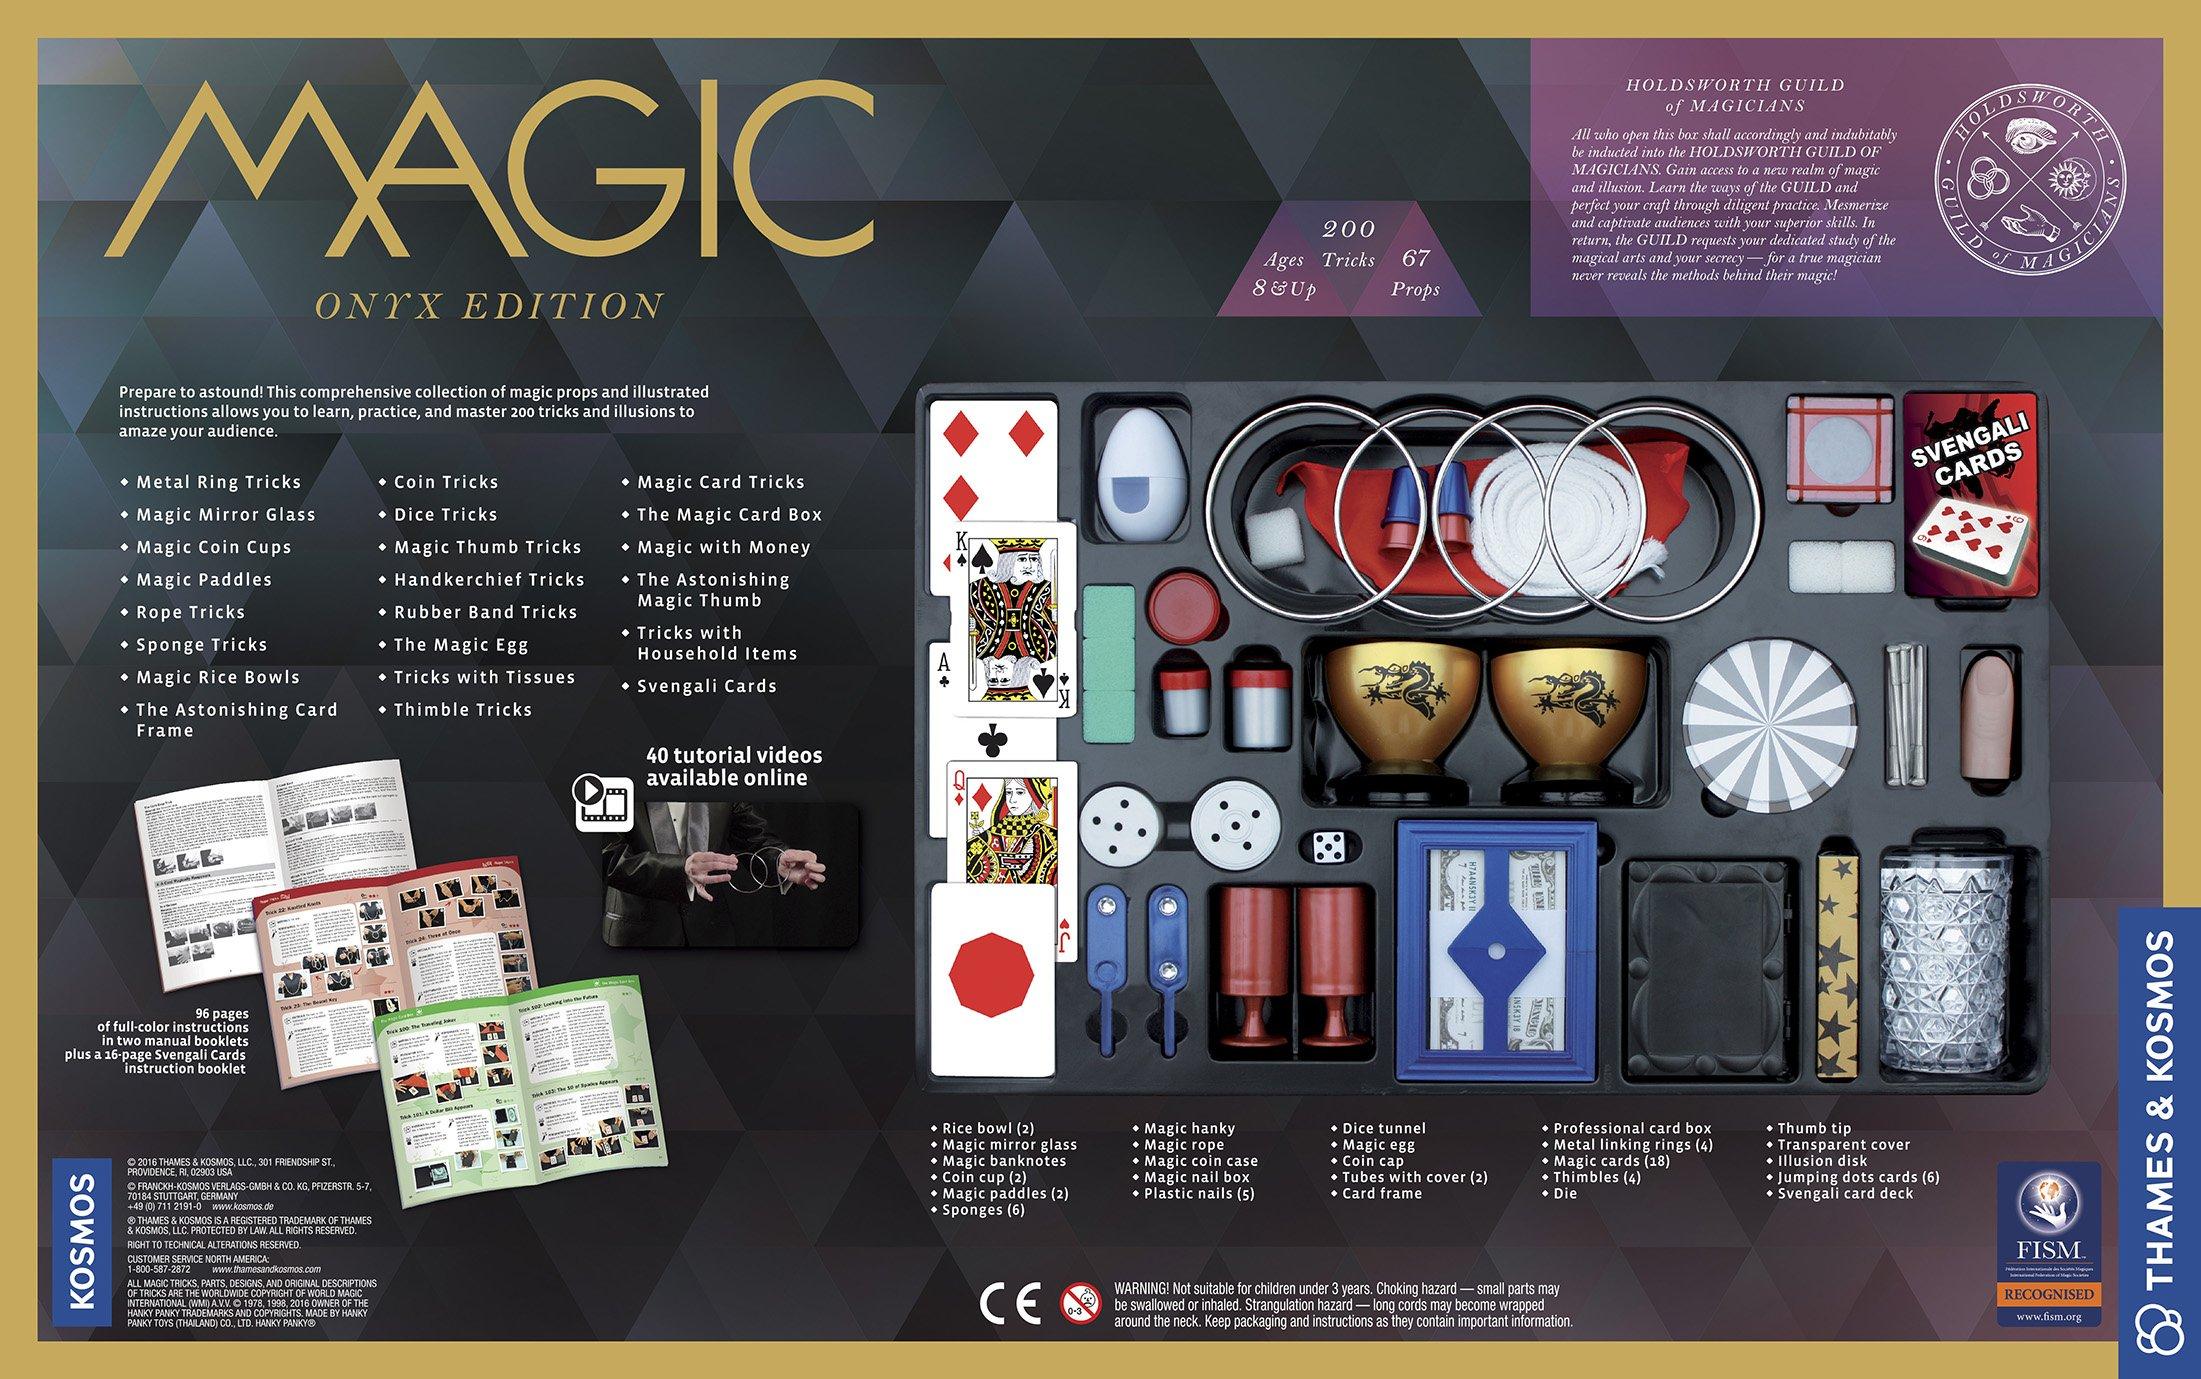 Thames & Kosmos Magic: Onyx Edition Playset with 200 Tricks by Thames & Kosmos (Image #2)